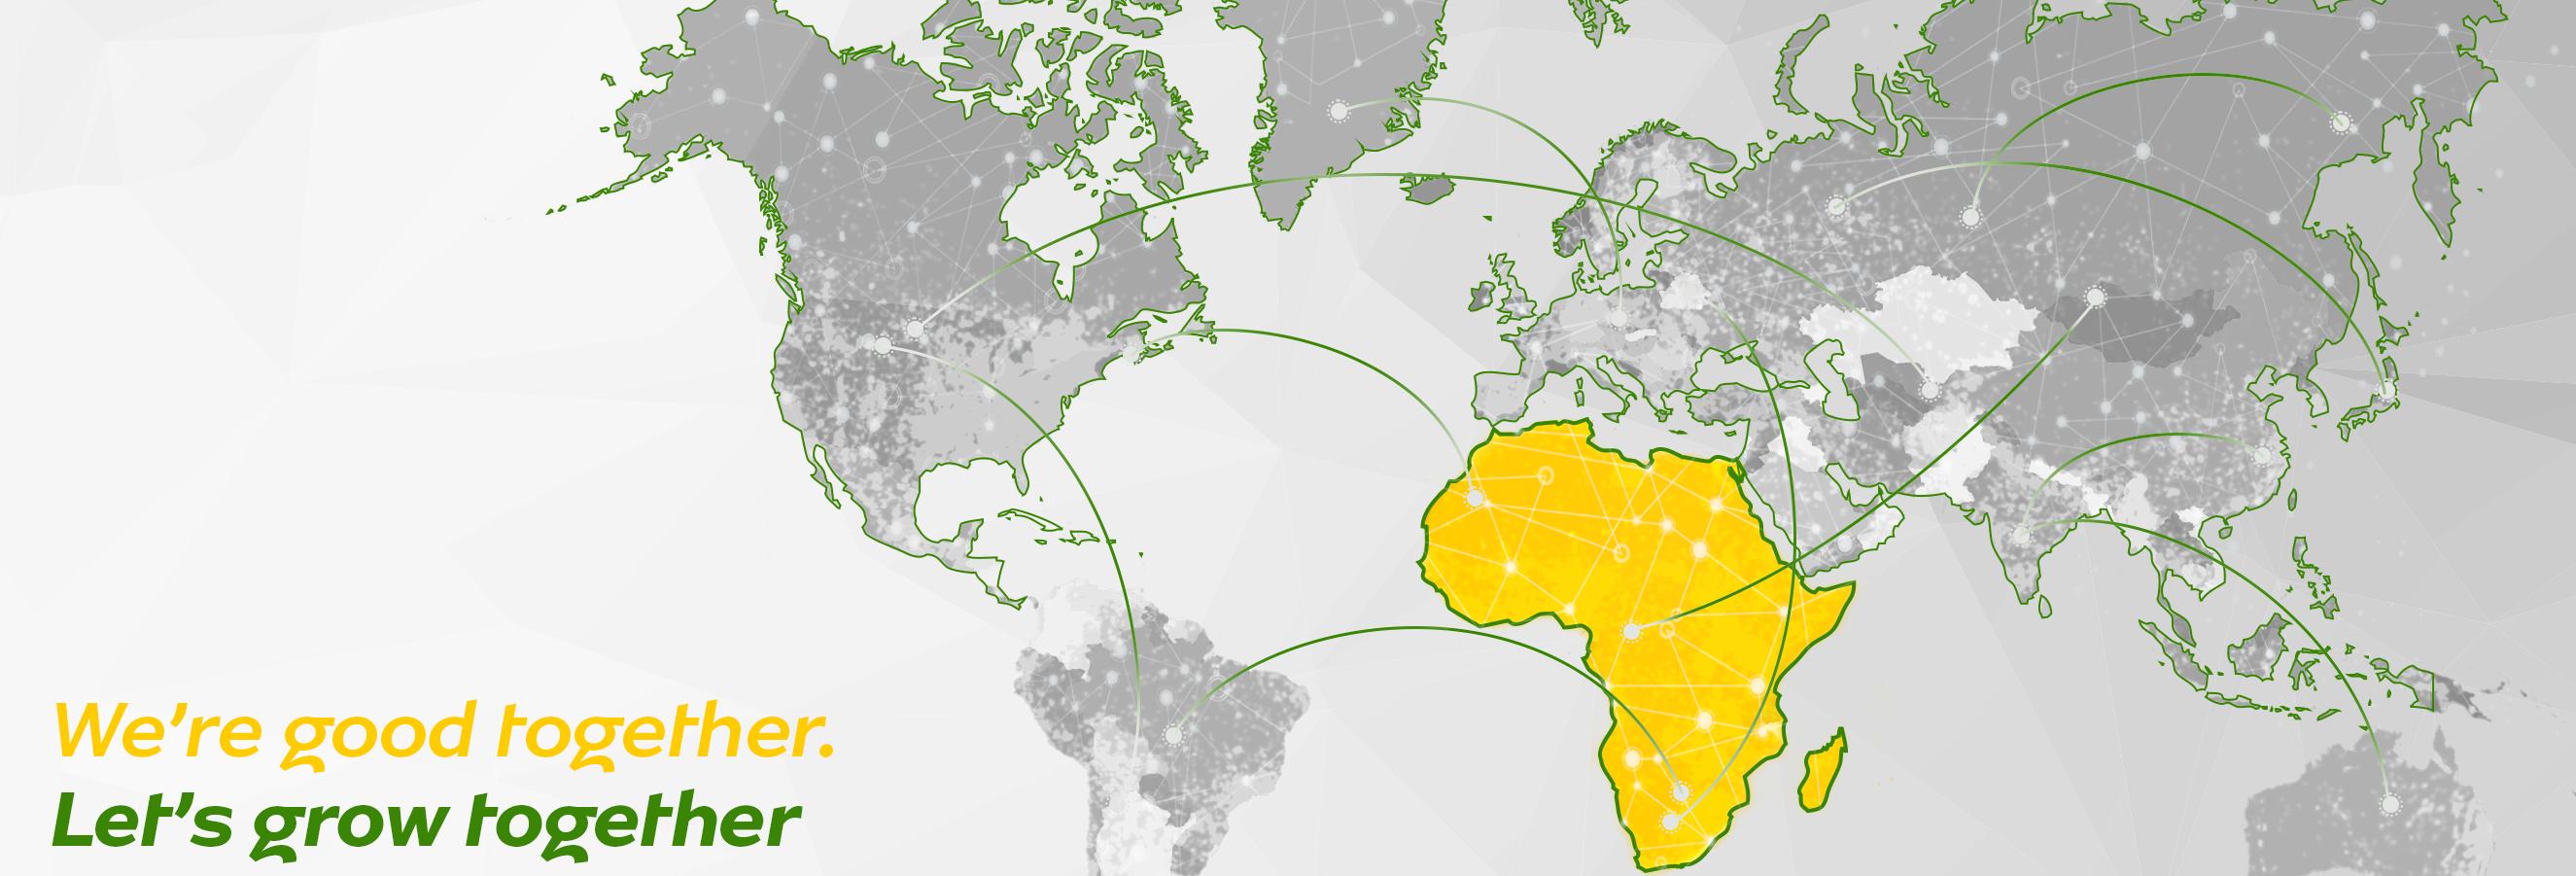 MTN GlobalConnect in the Spotlight